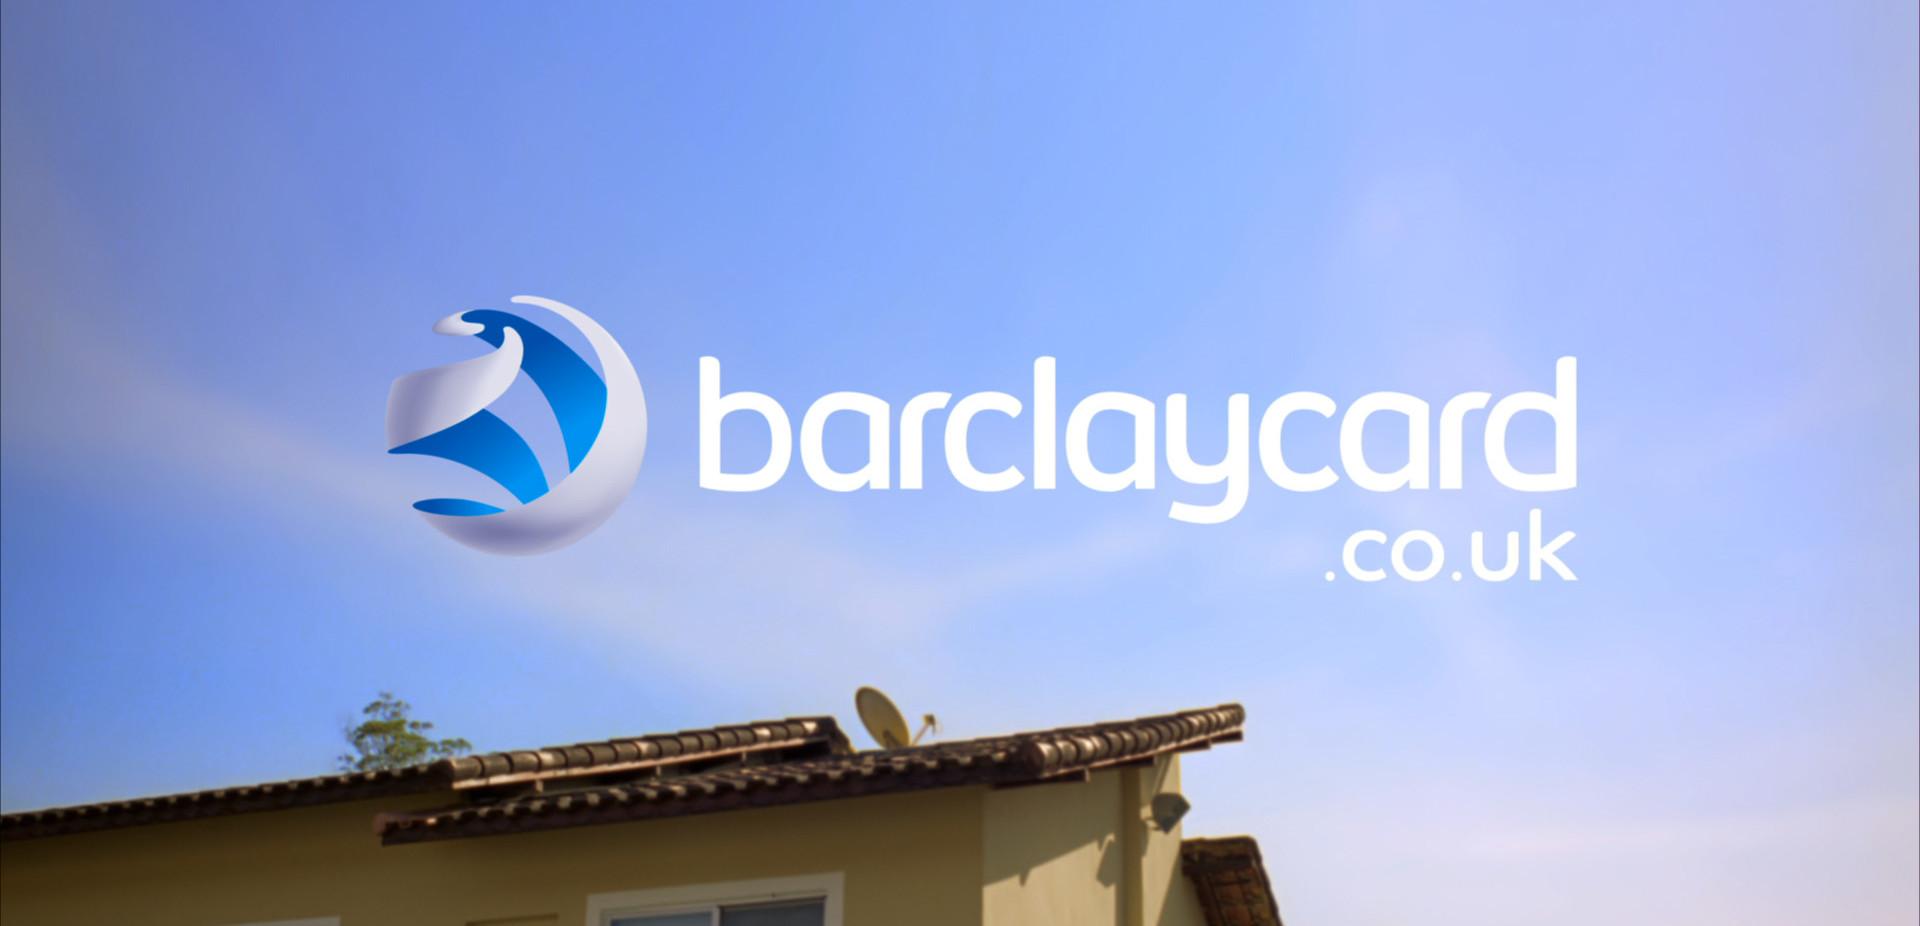 barclaycard_Still12.jpg